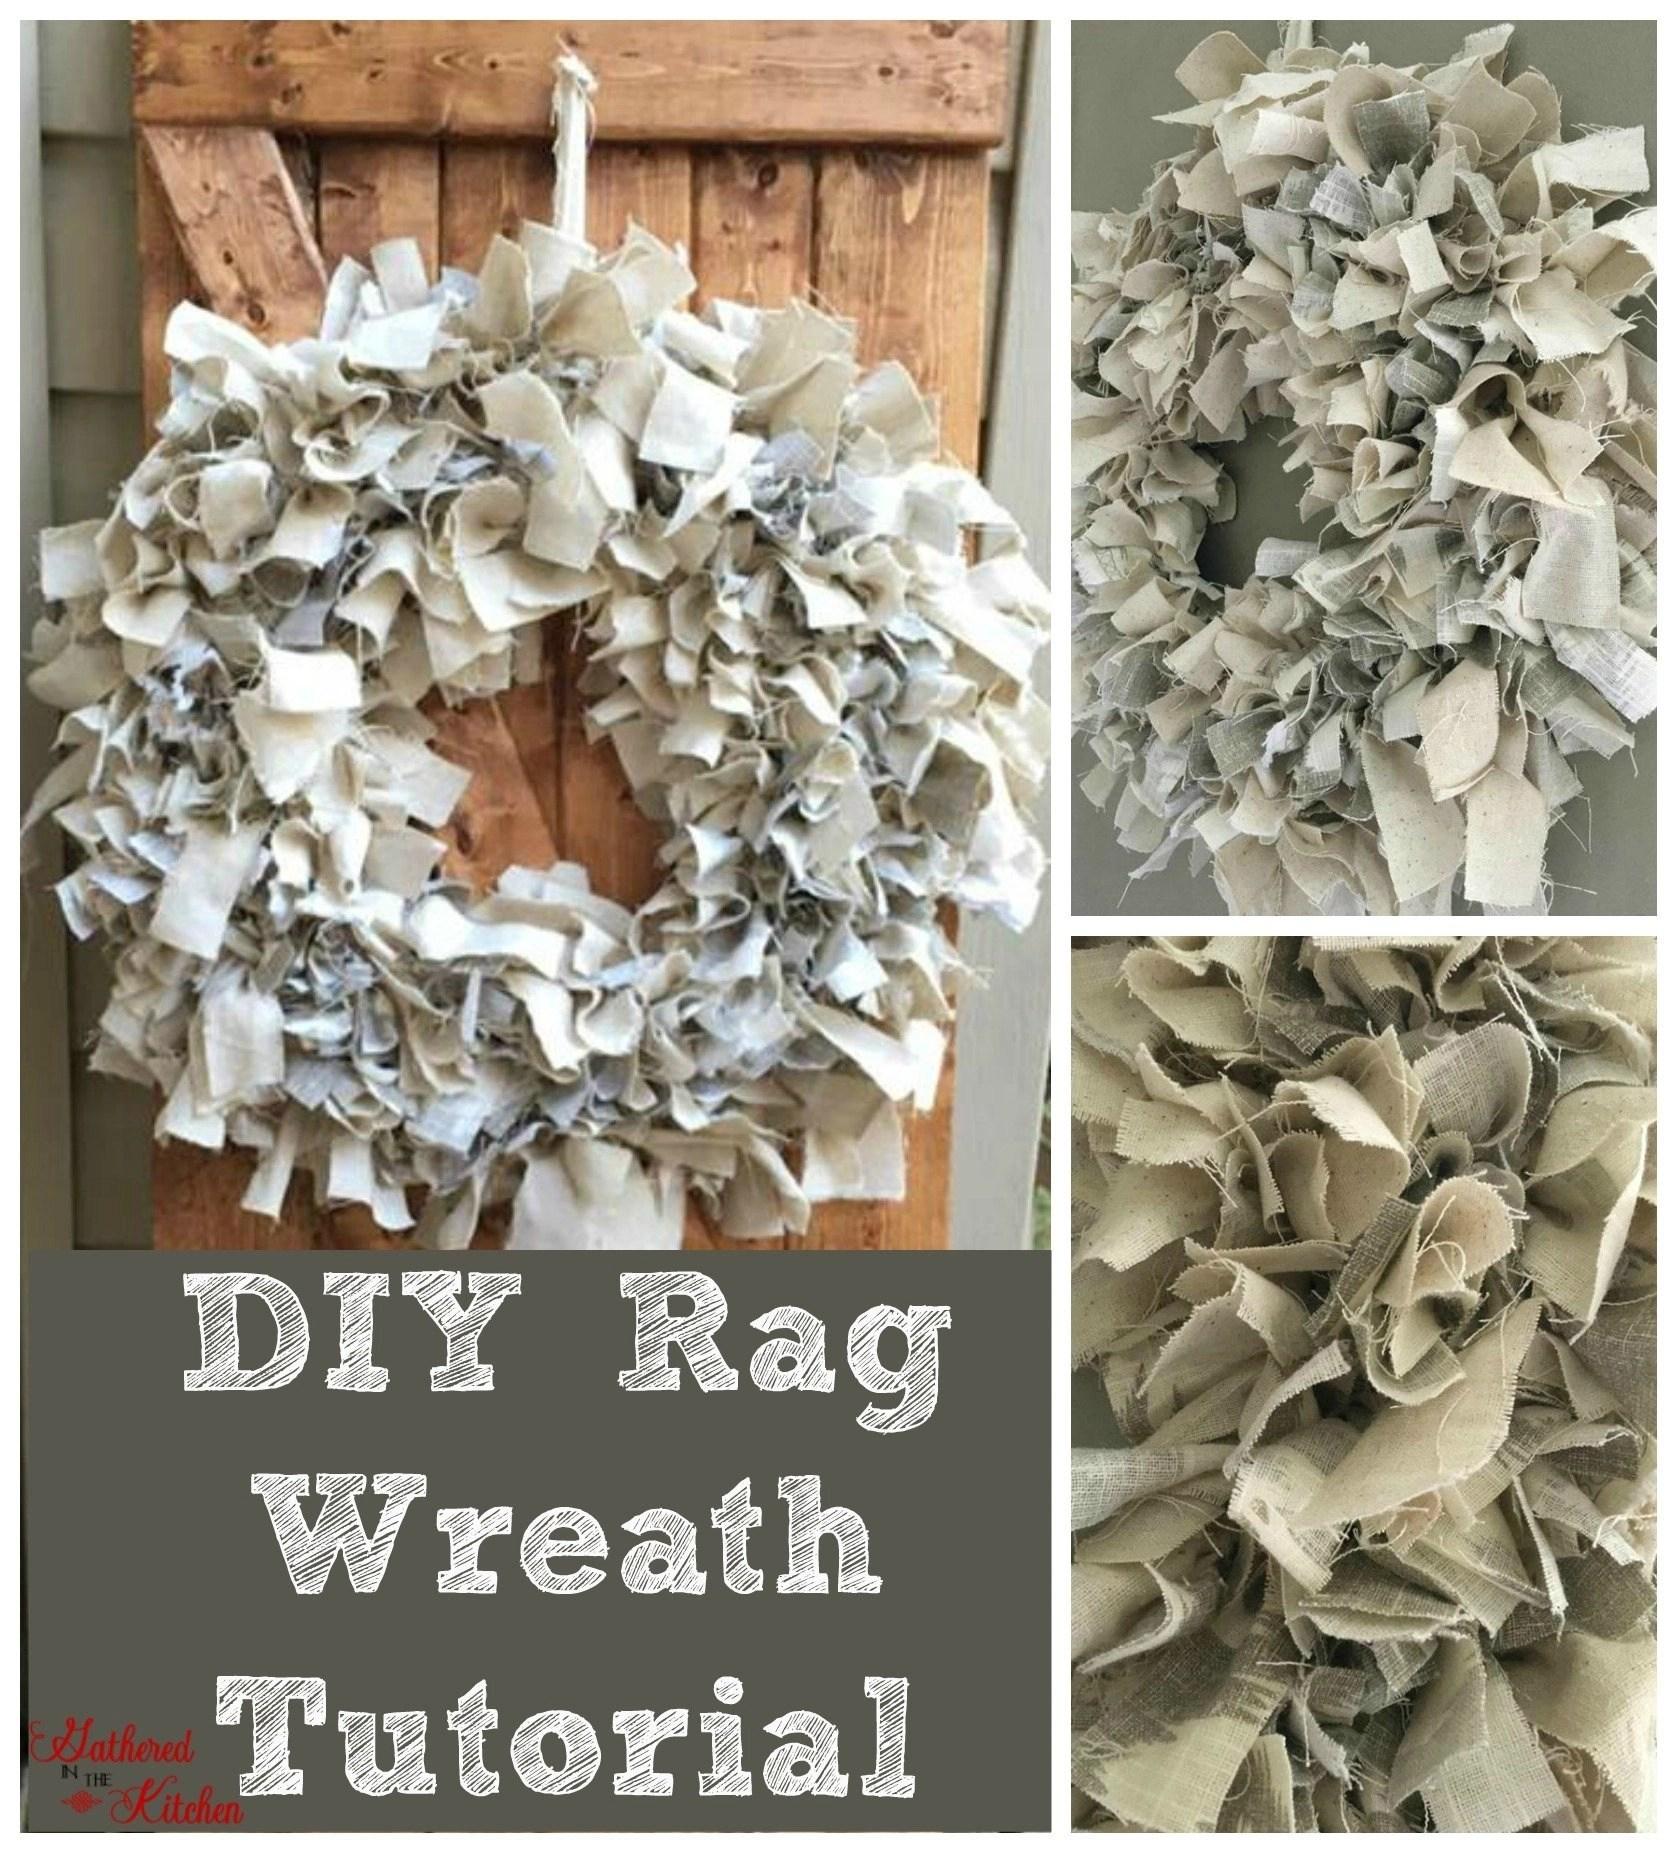 Diy Rag Wreath Tutorial Beginner Level Project Amp Costs